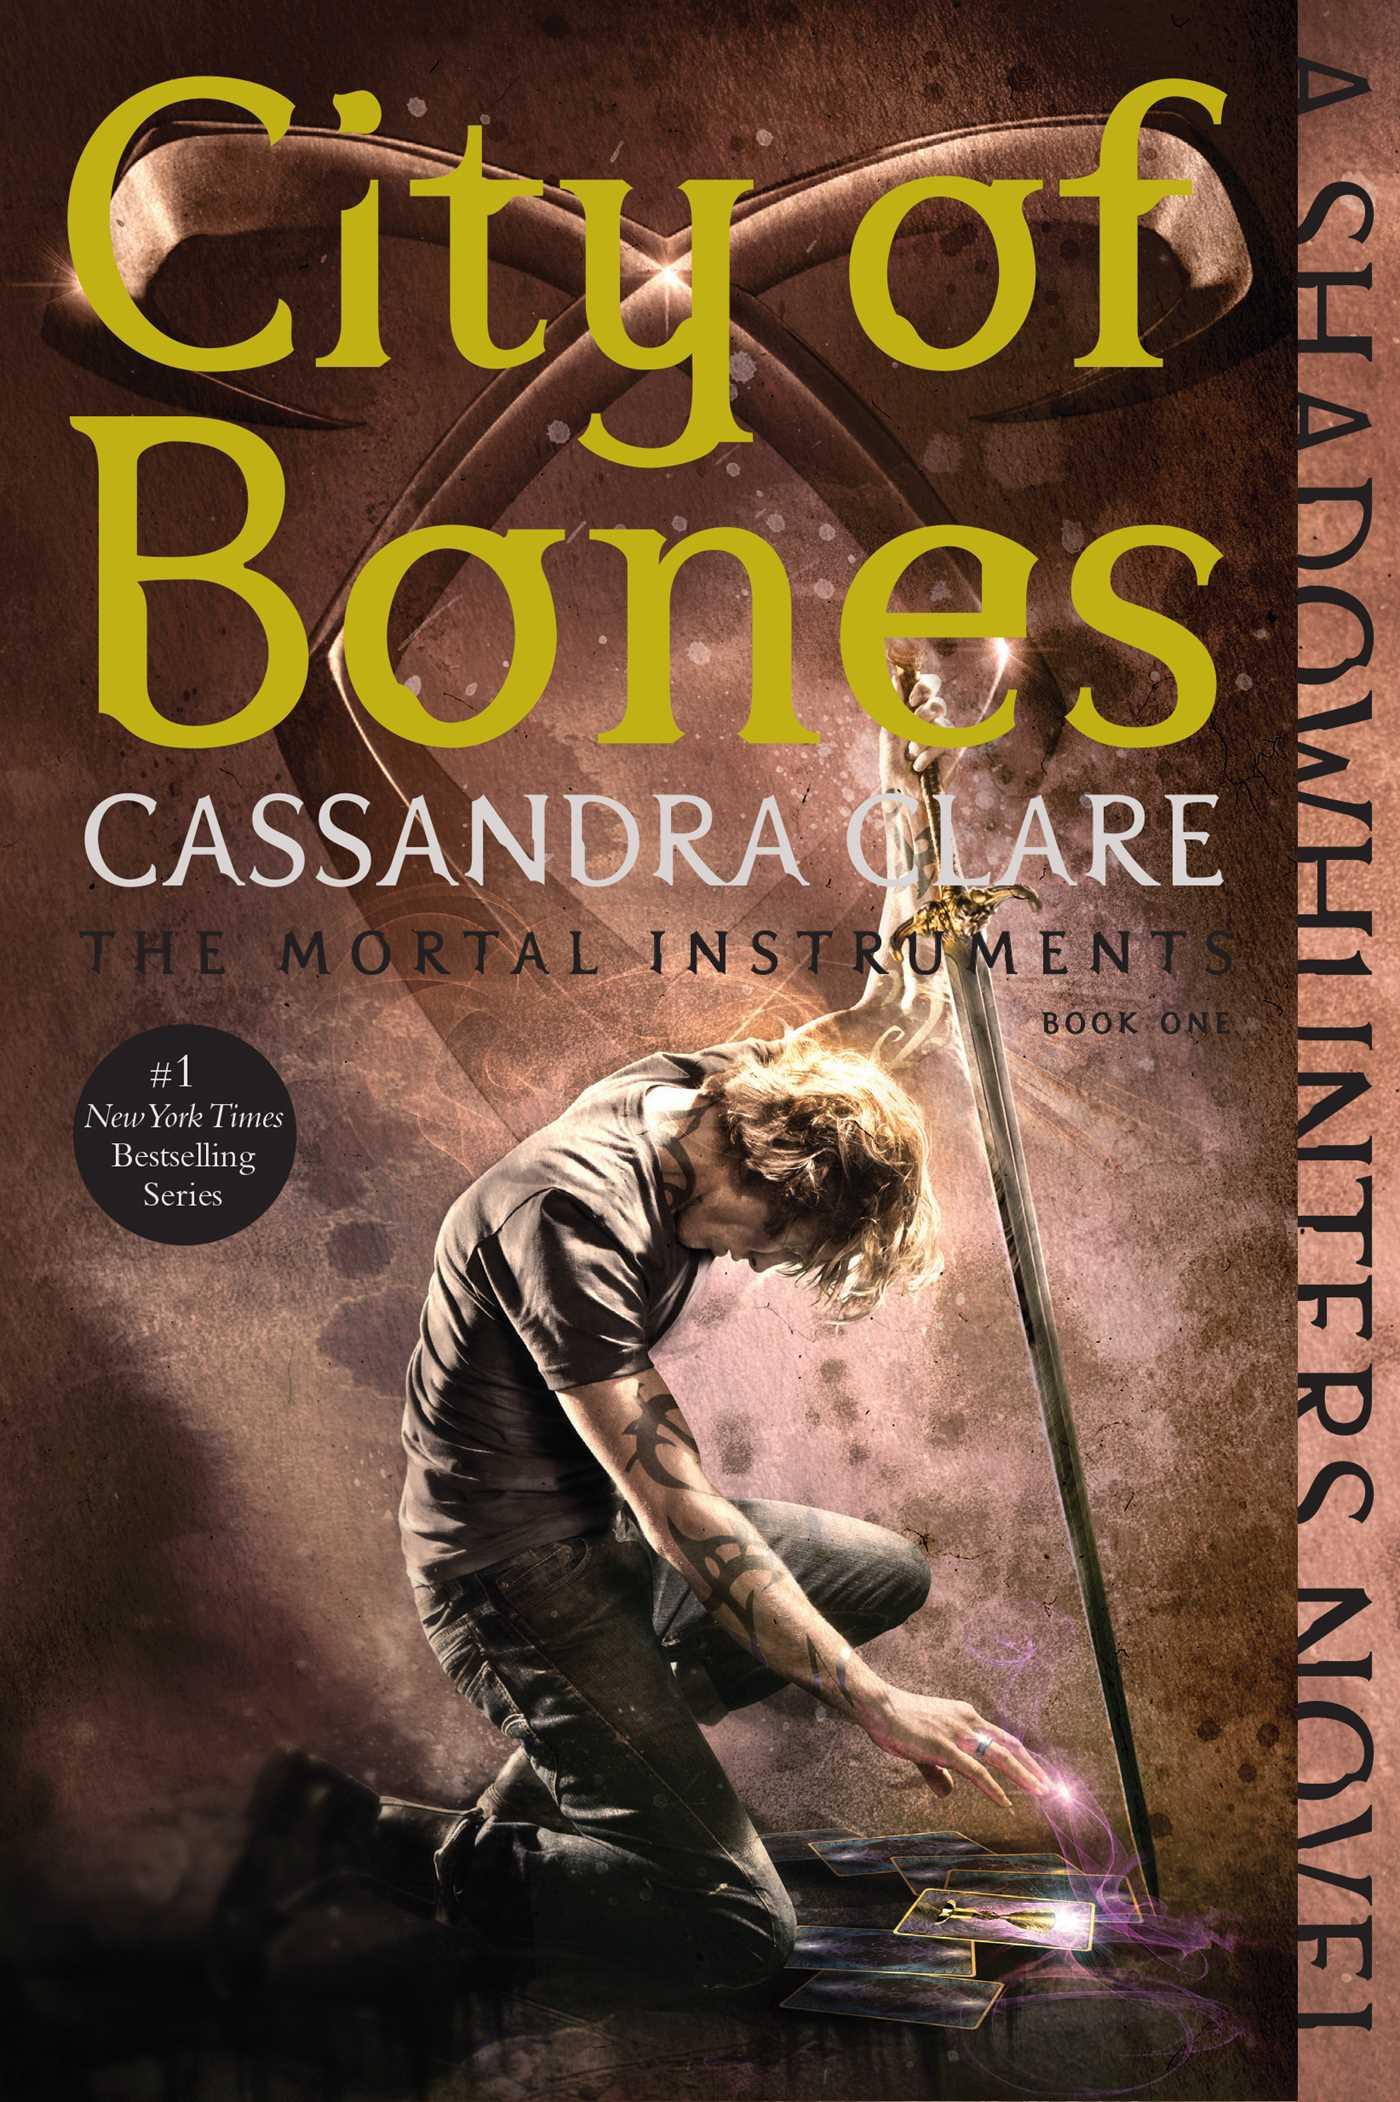 City of bones 9781416995753 hr